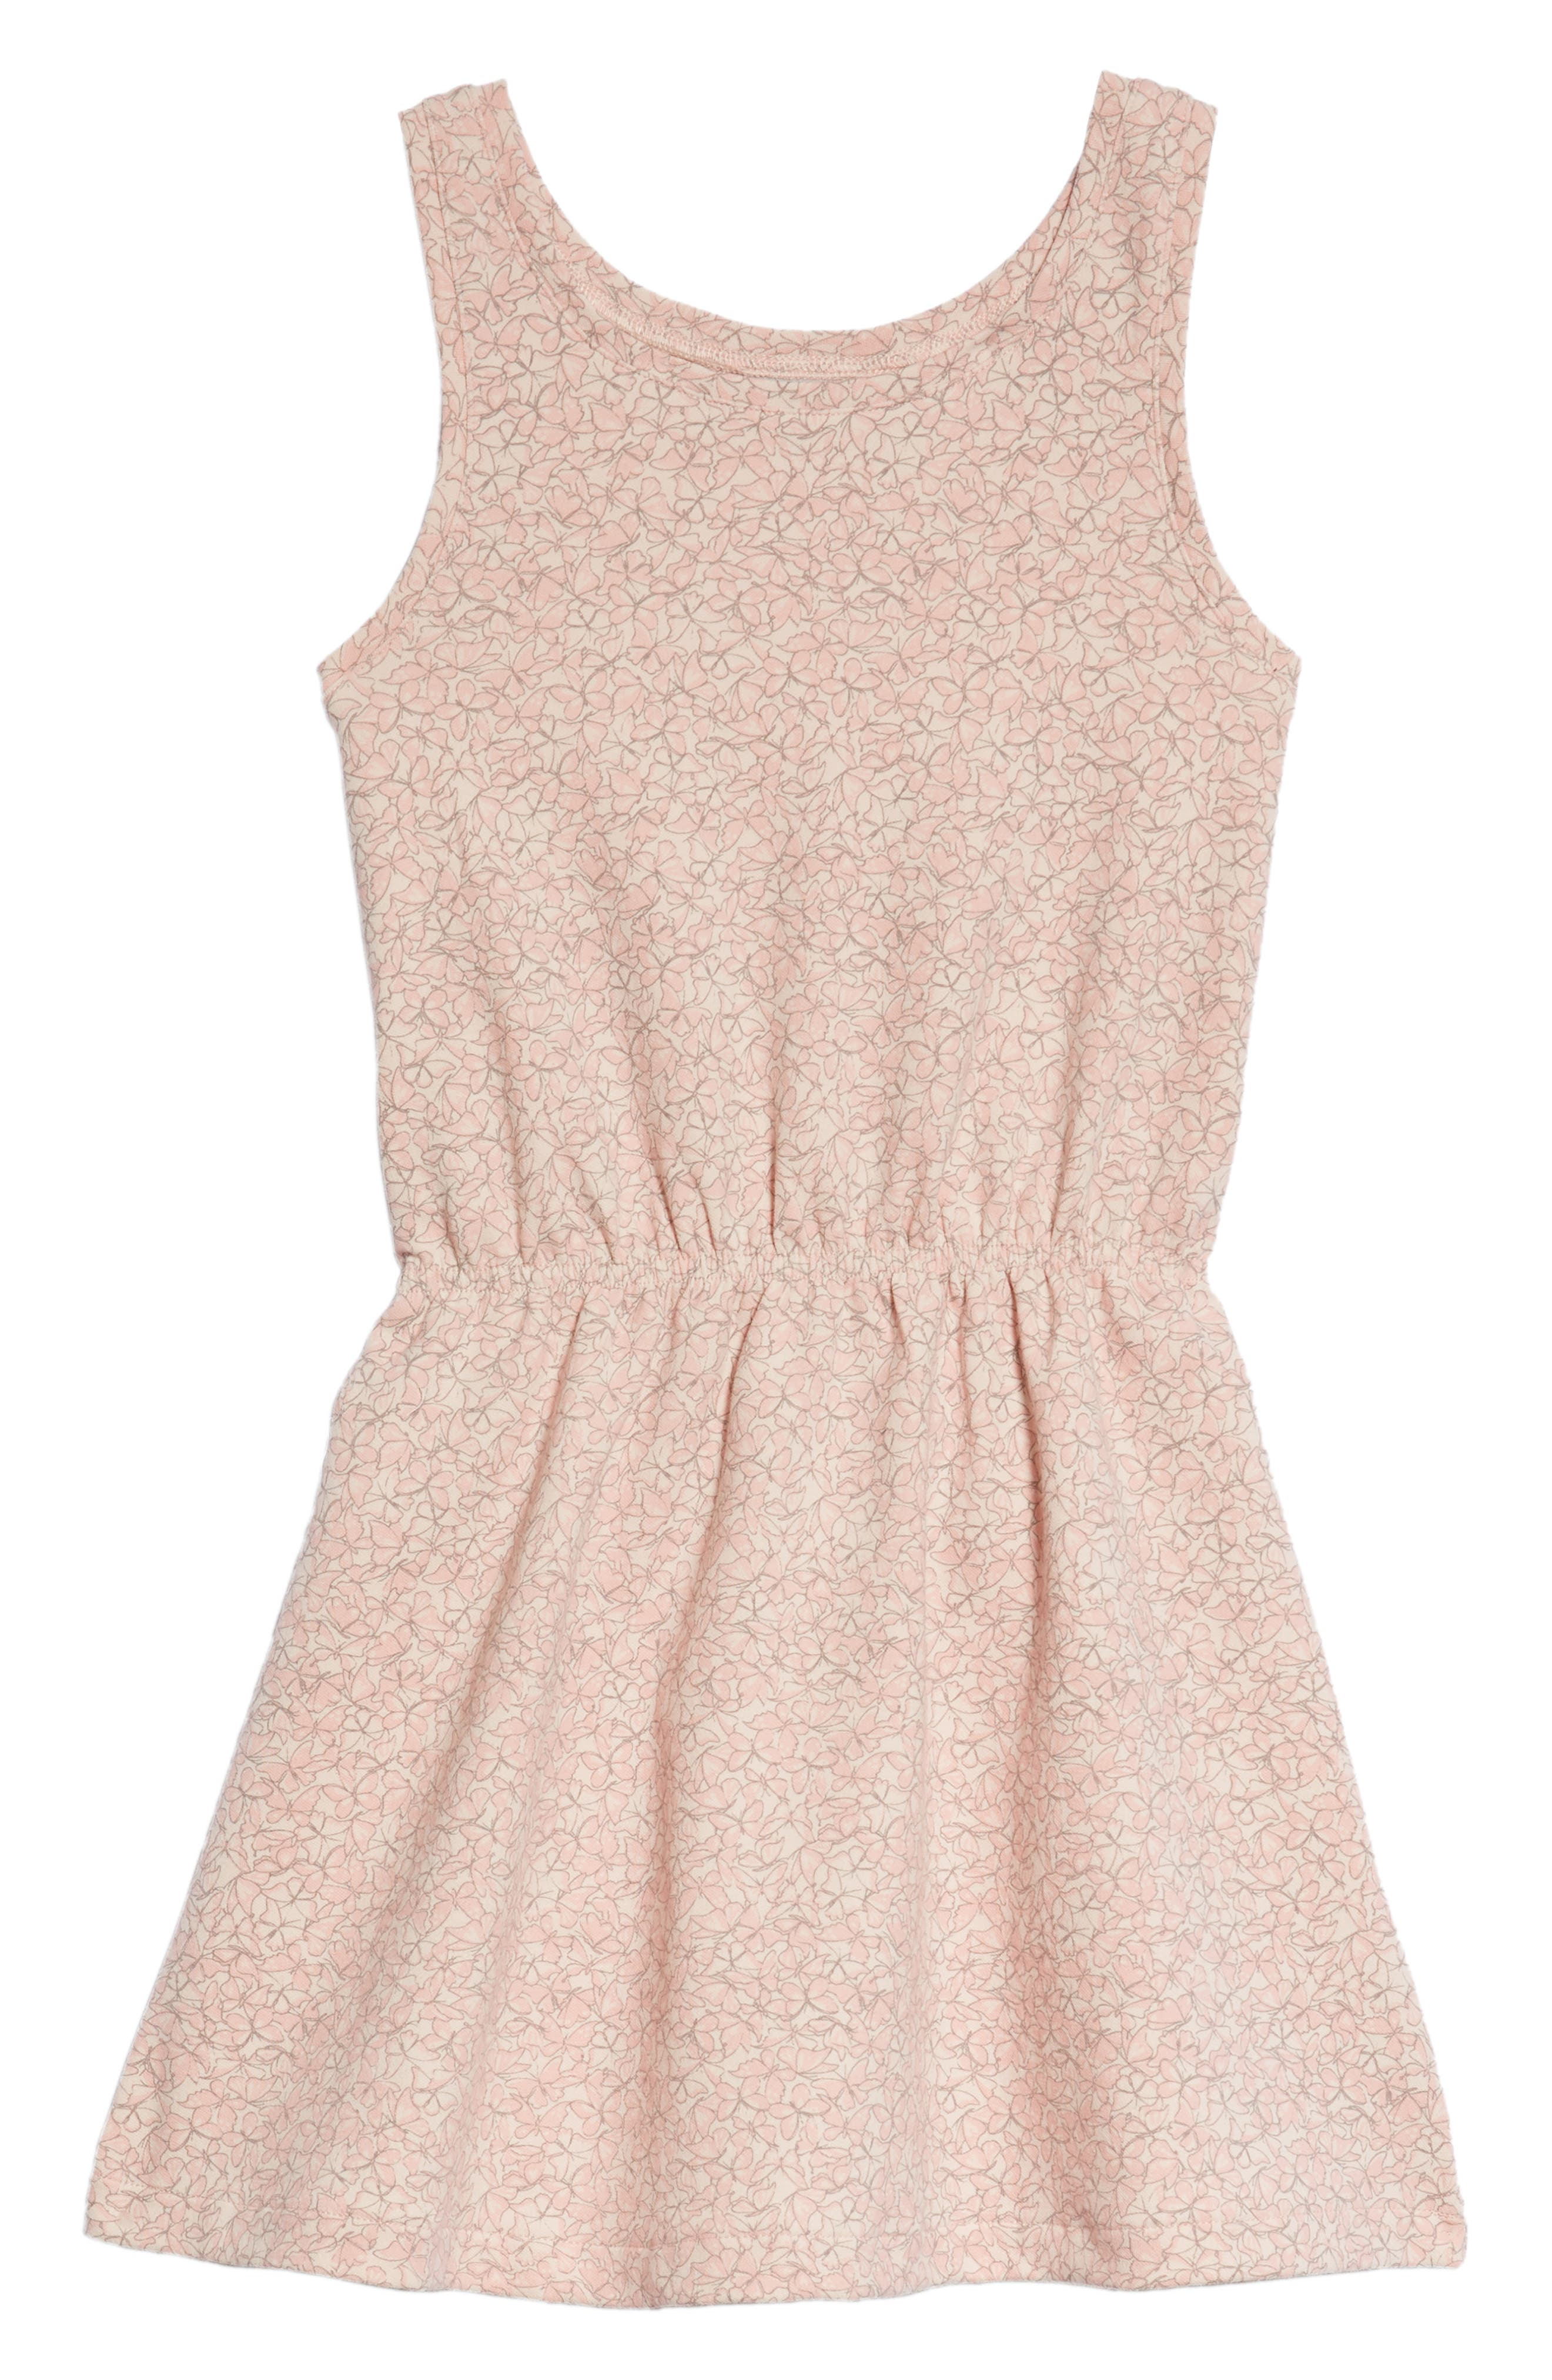 Wheat Bridgit Dress (Toddler Girls, Little Girls & Big Girls)